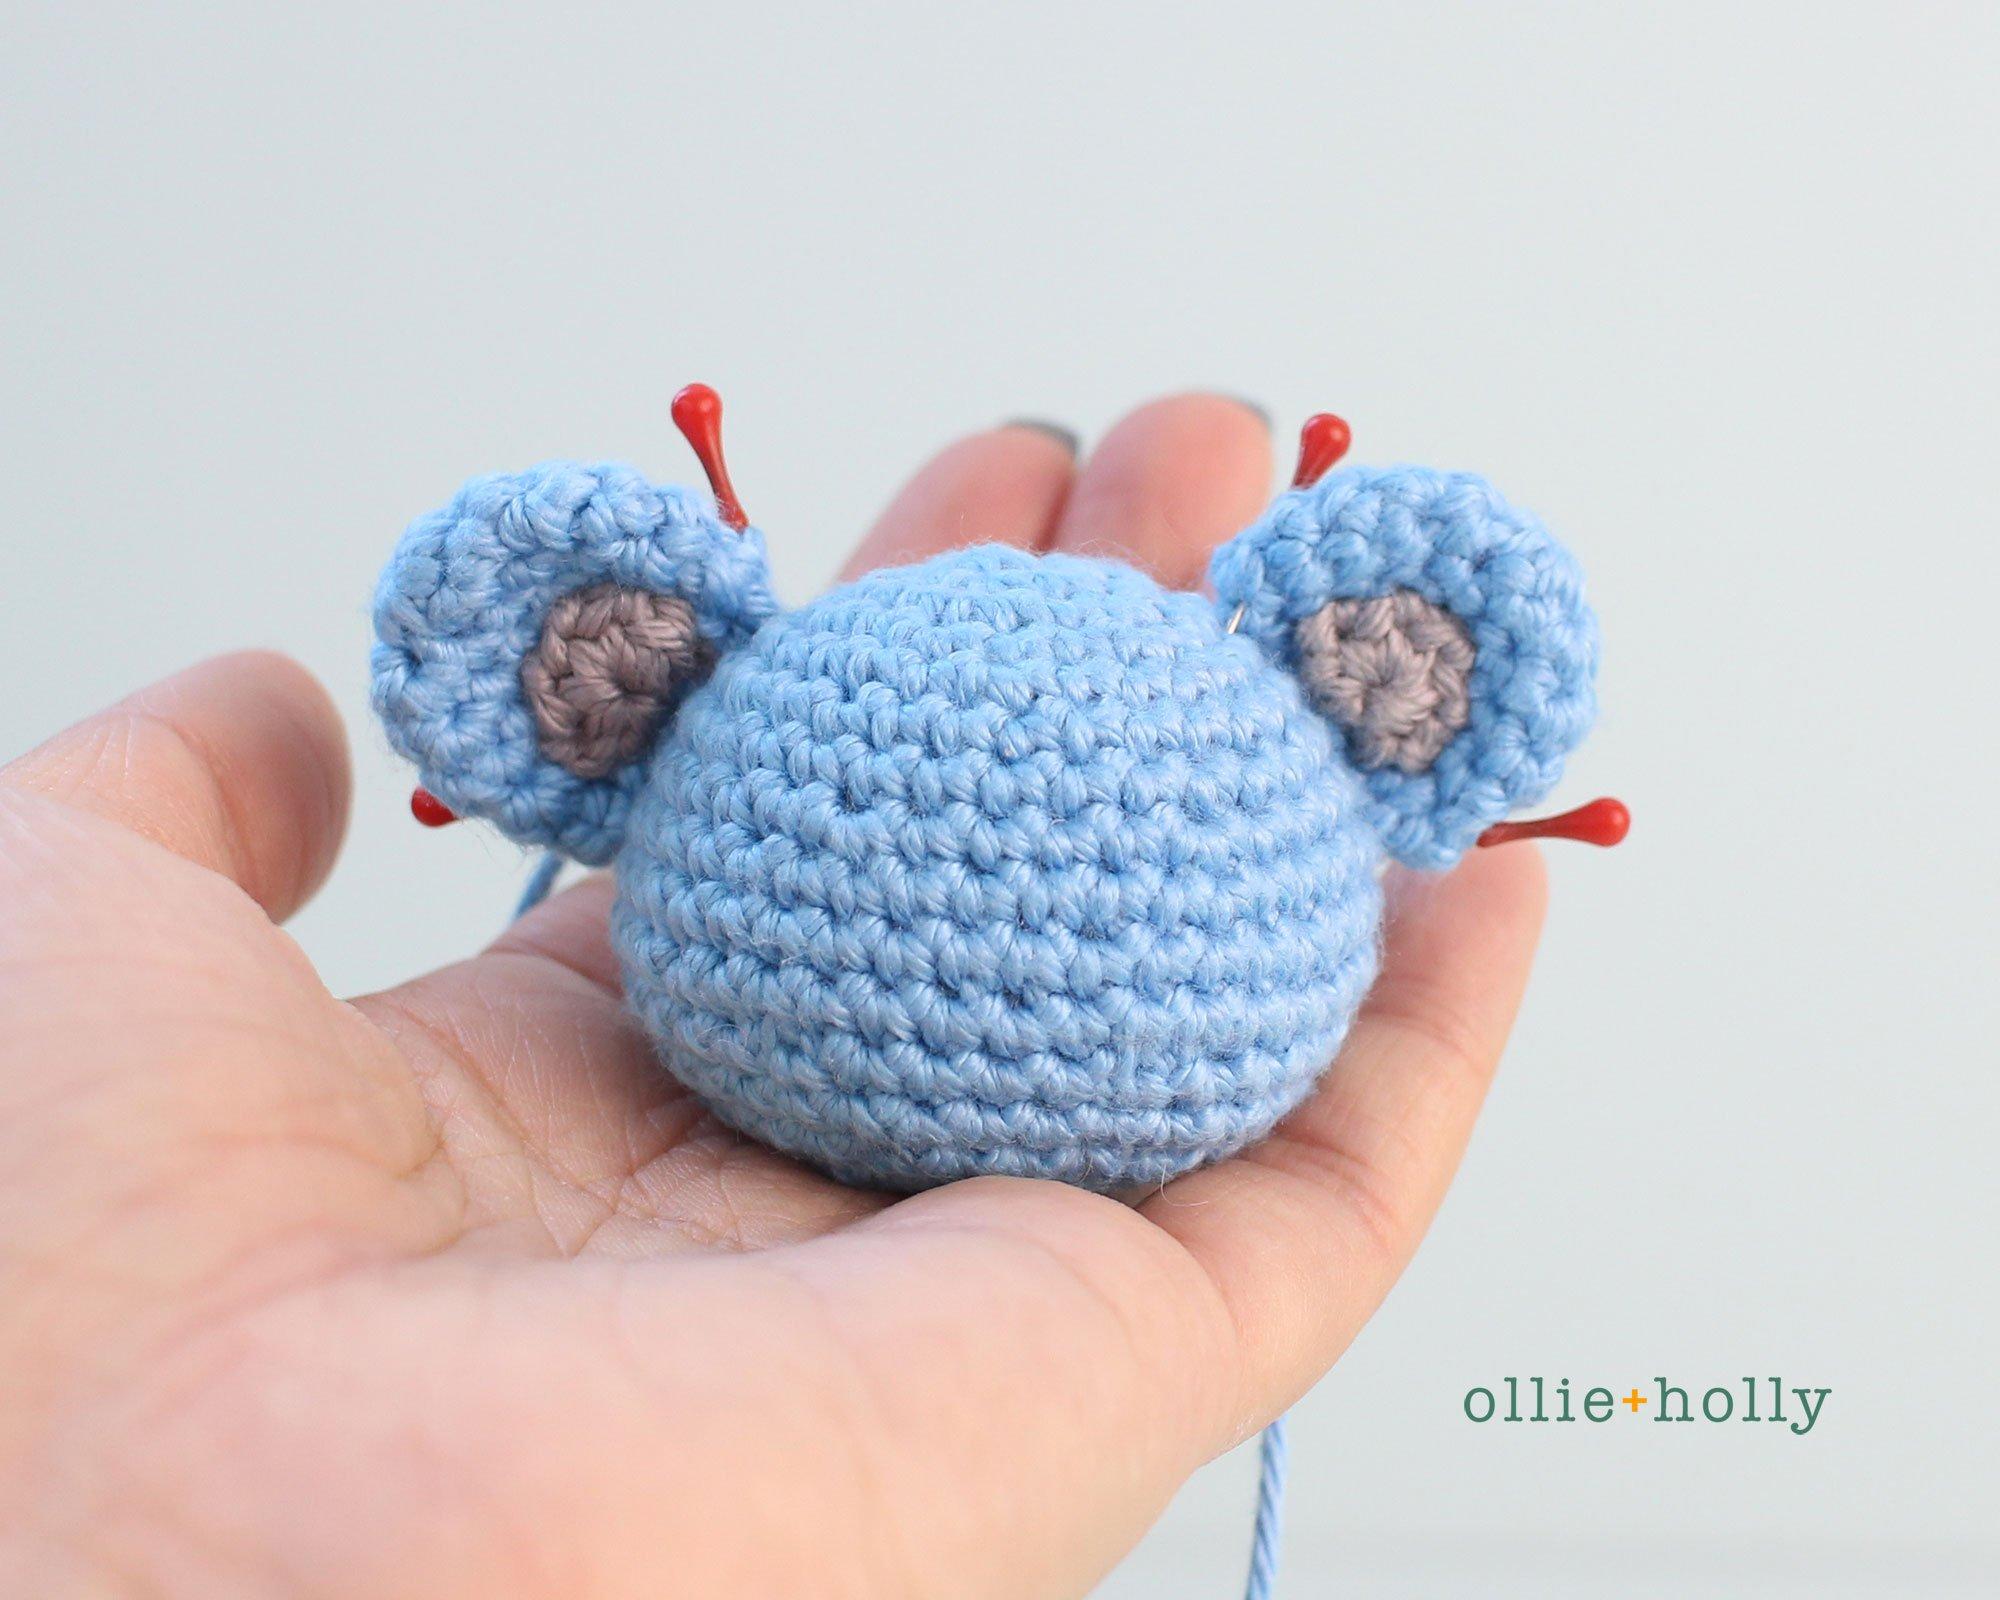 Free BT21 Koya Christmas Ornament Amigurumi Crochet Pattern Step 6